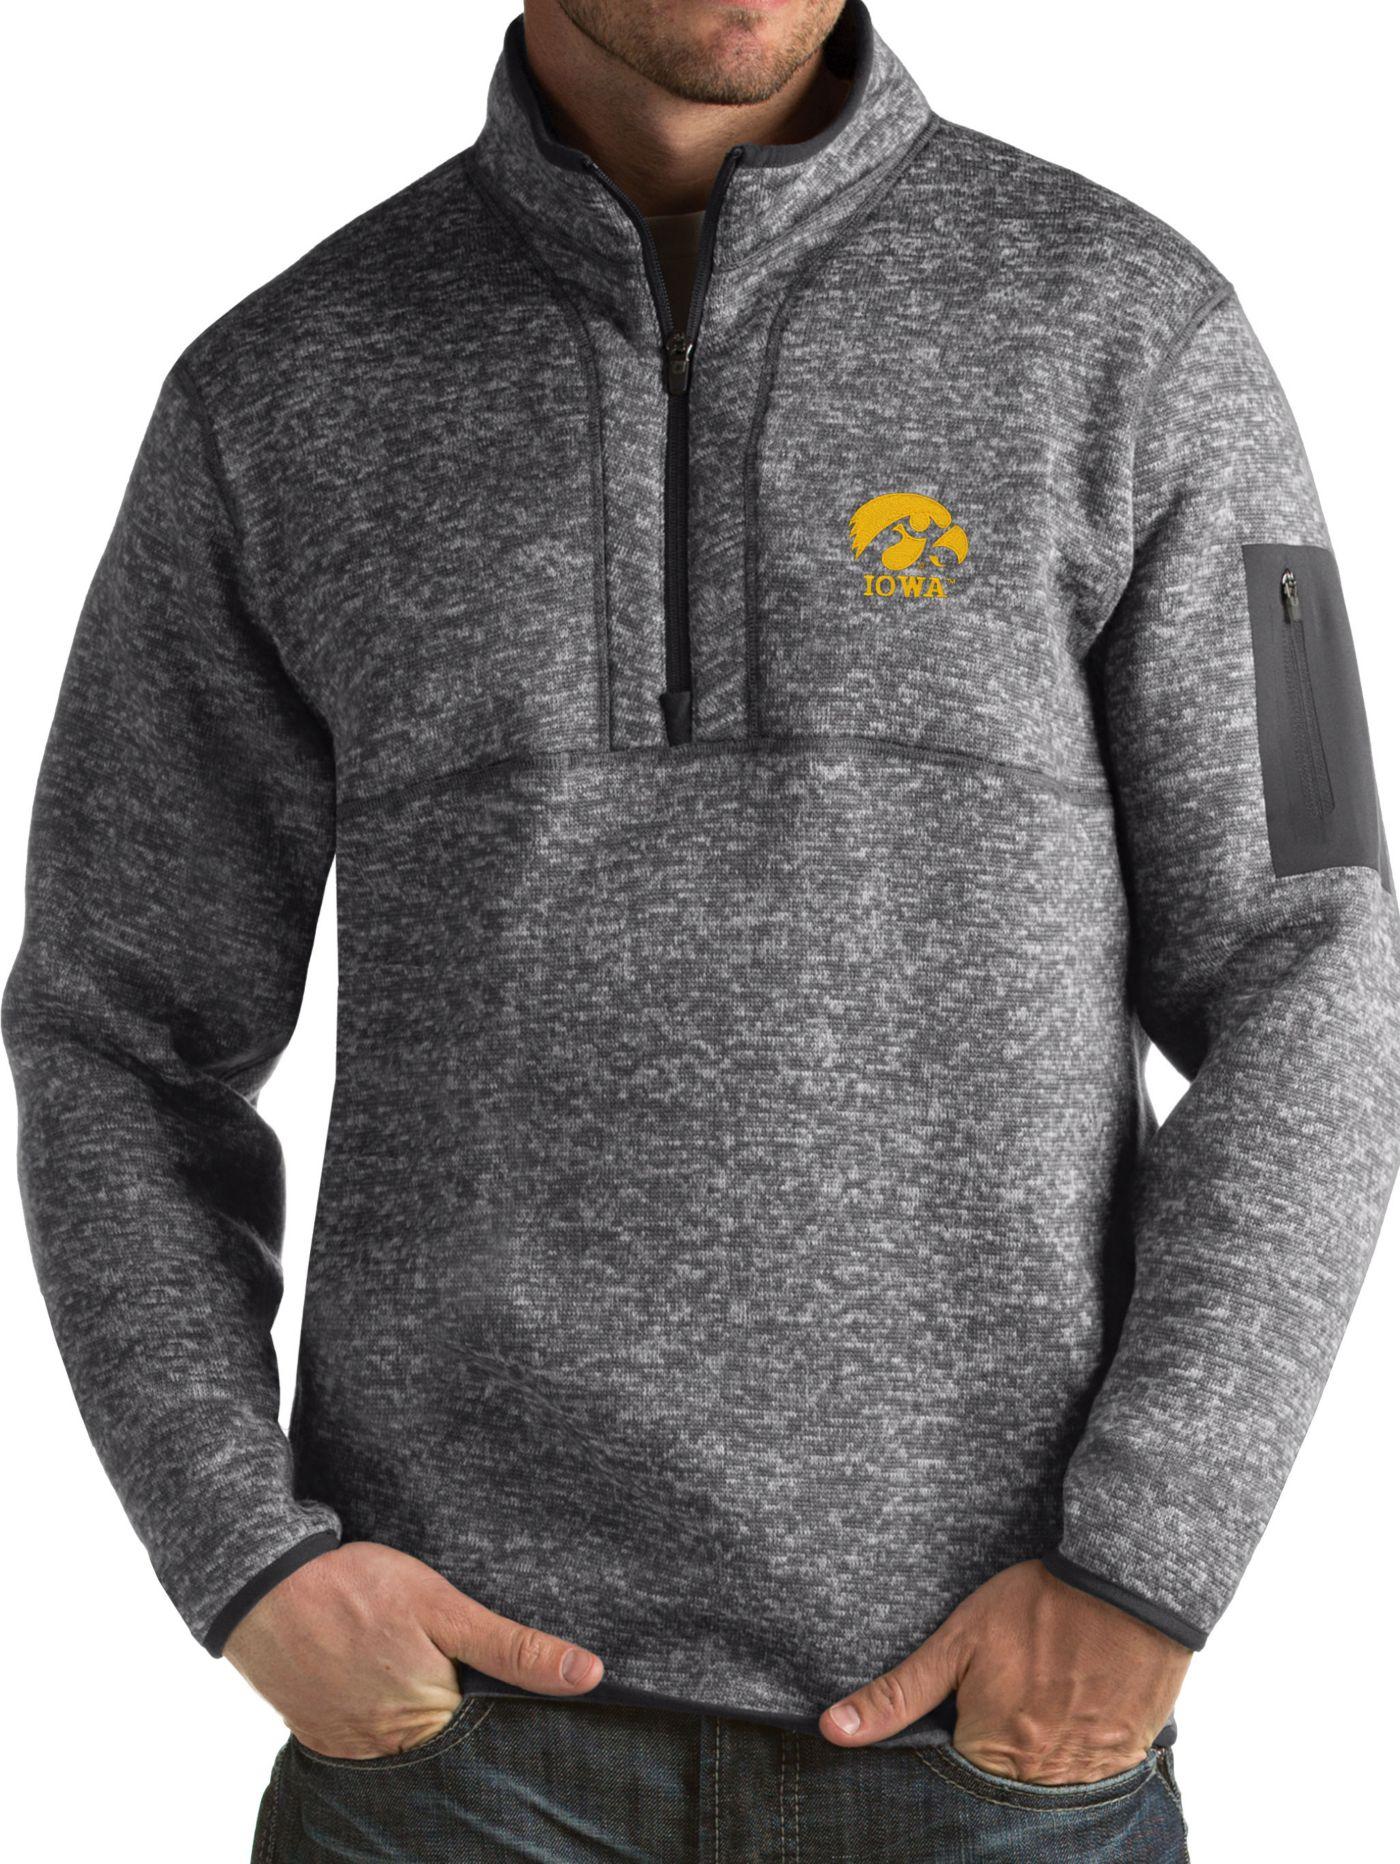 Antigua Men's Iowa Hawkeyes Grey Fortune Pullover Jacket